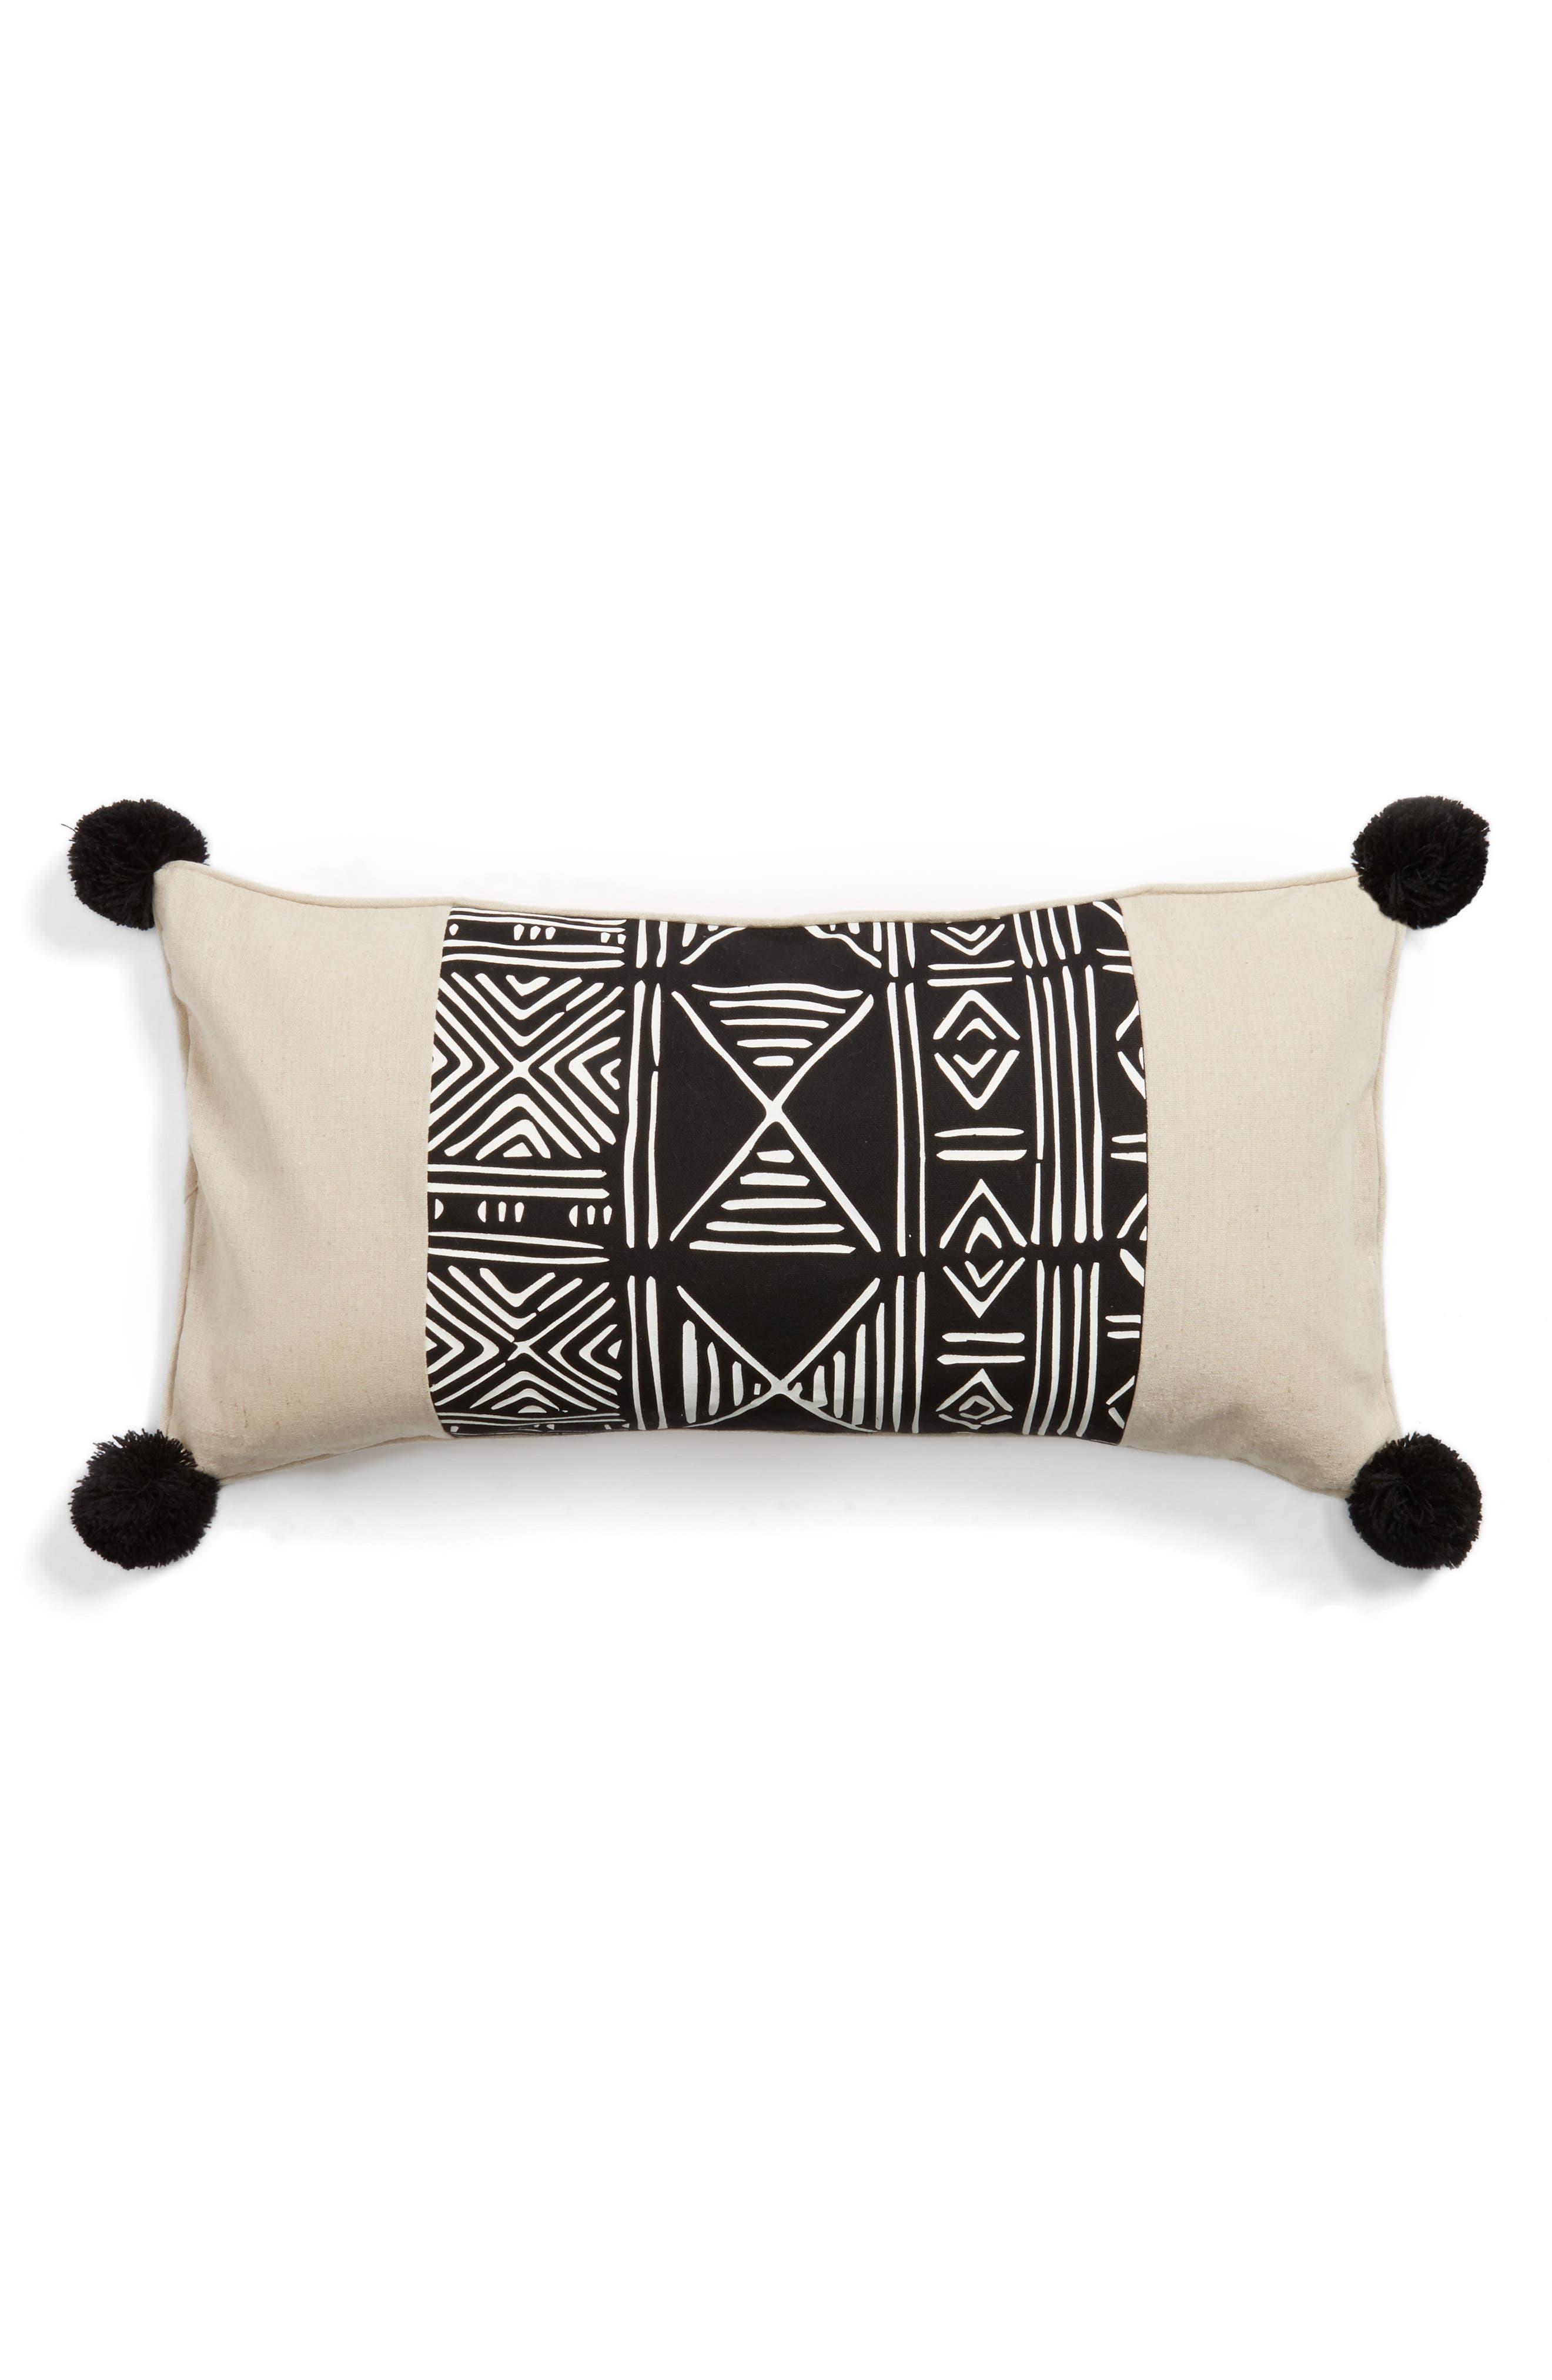 Tali Pom Decorative Pillow,                         Main,                         color, Black/ White